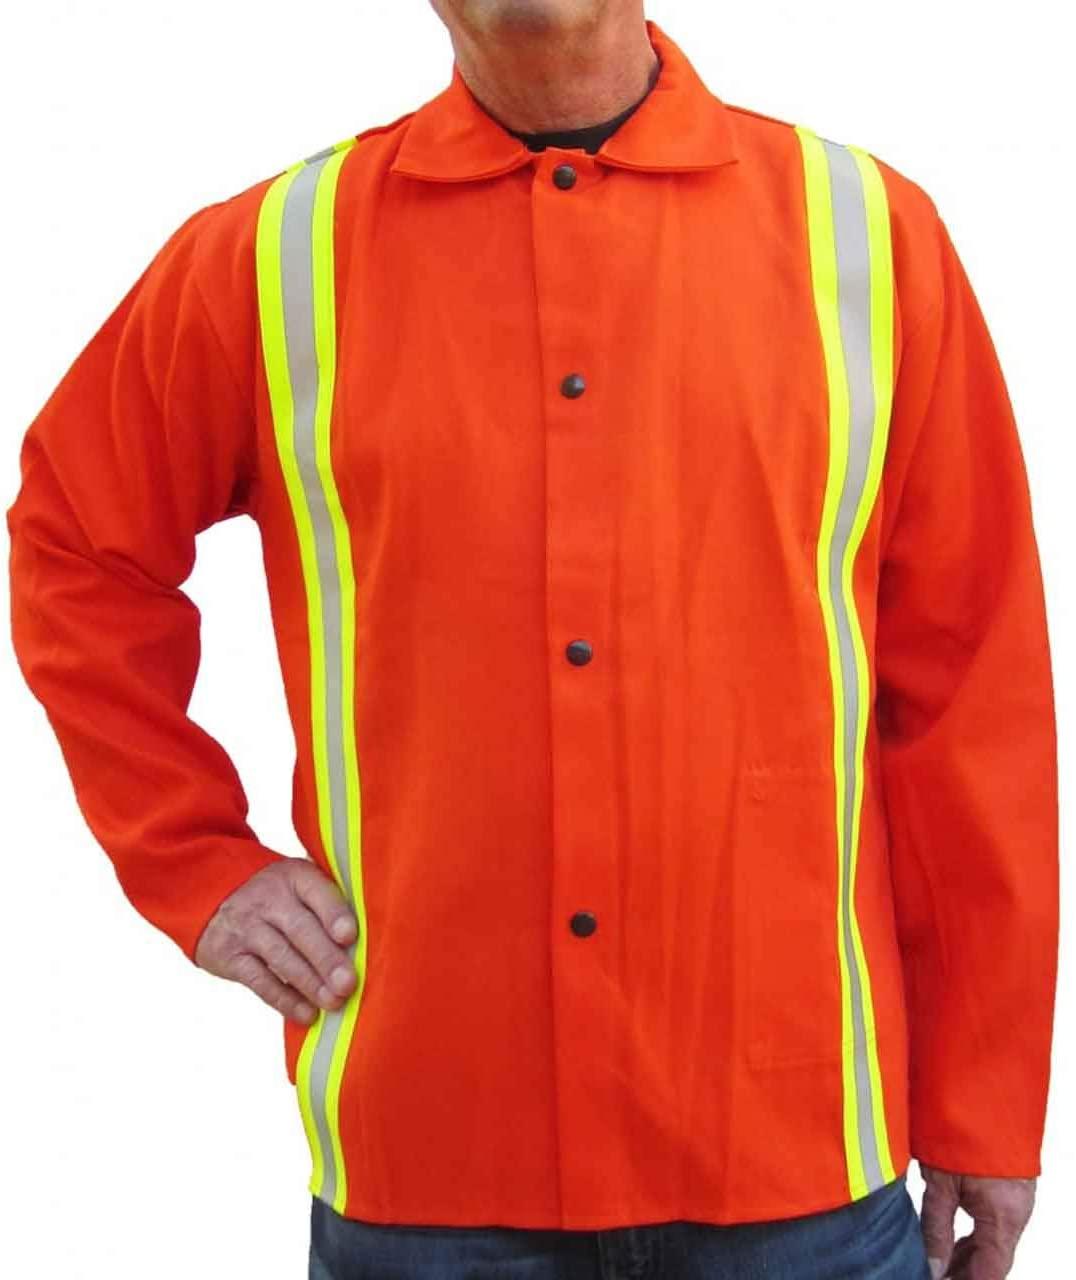 Tillman 6230DRQ 30 9 oz. Orange FR Cotton Welding Jacket with Reflective Tape, 4X-Large